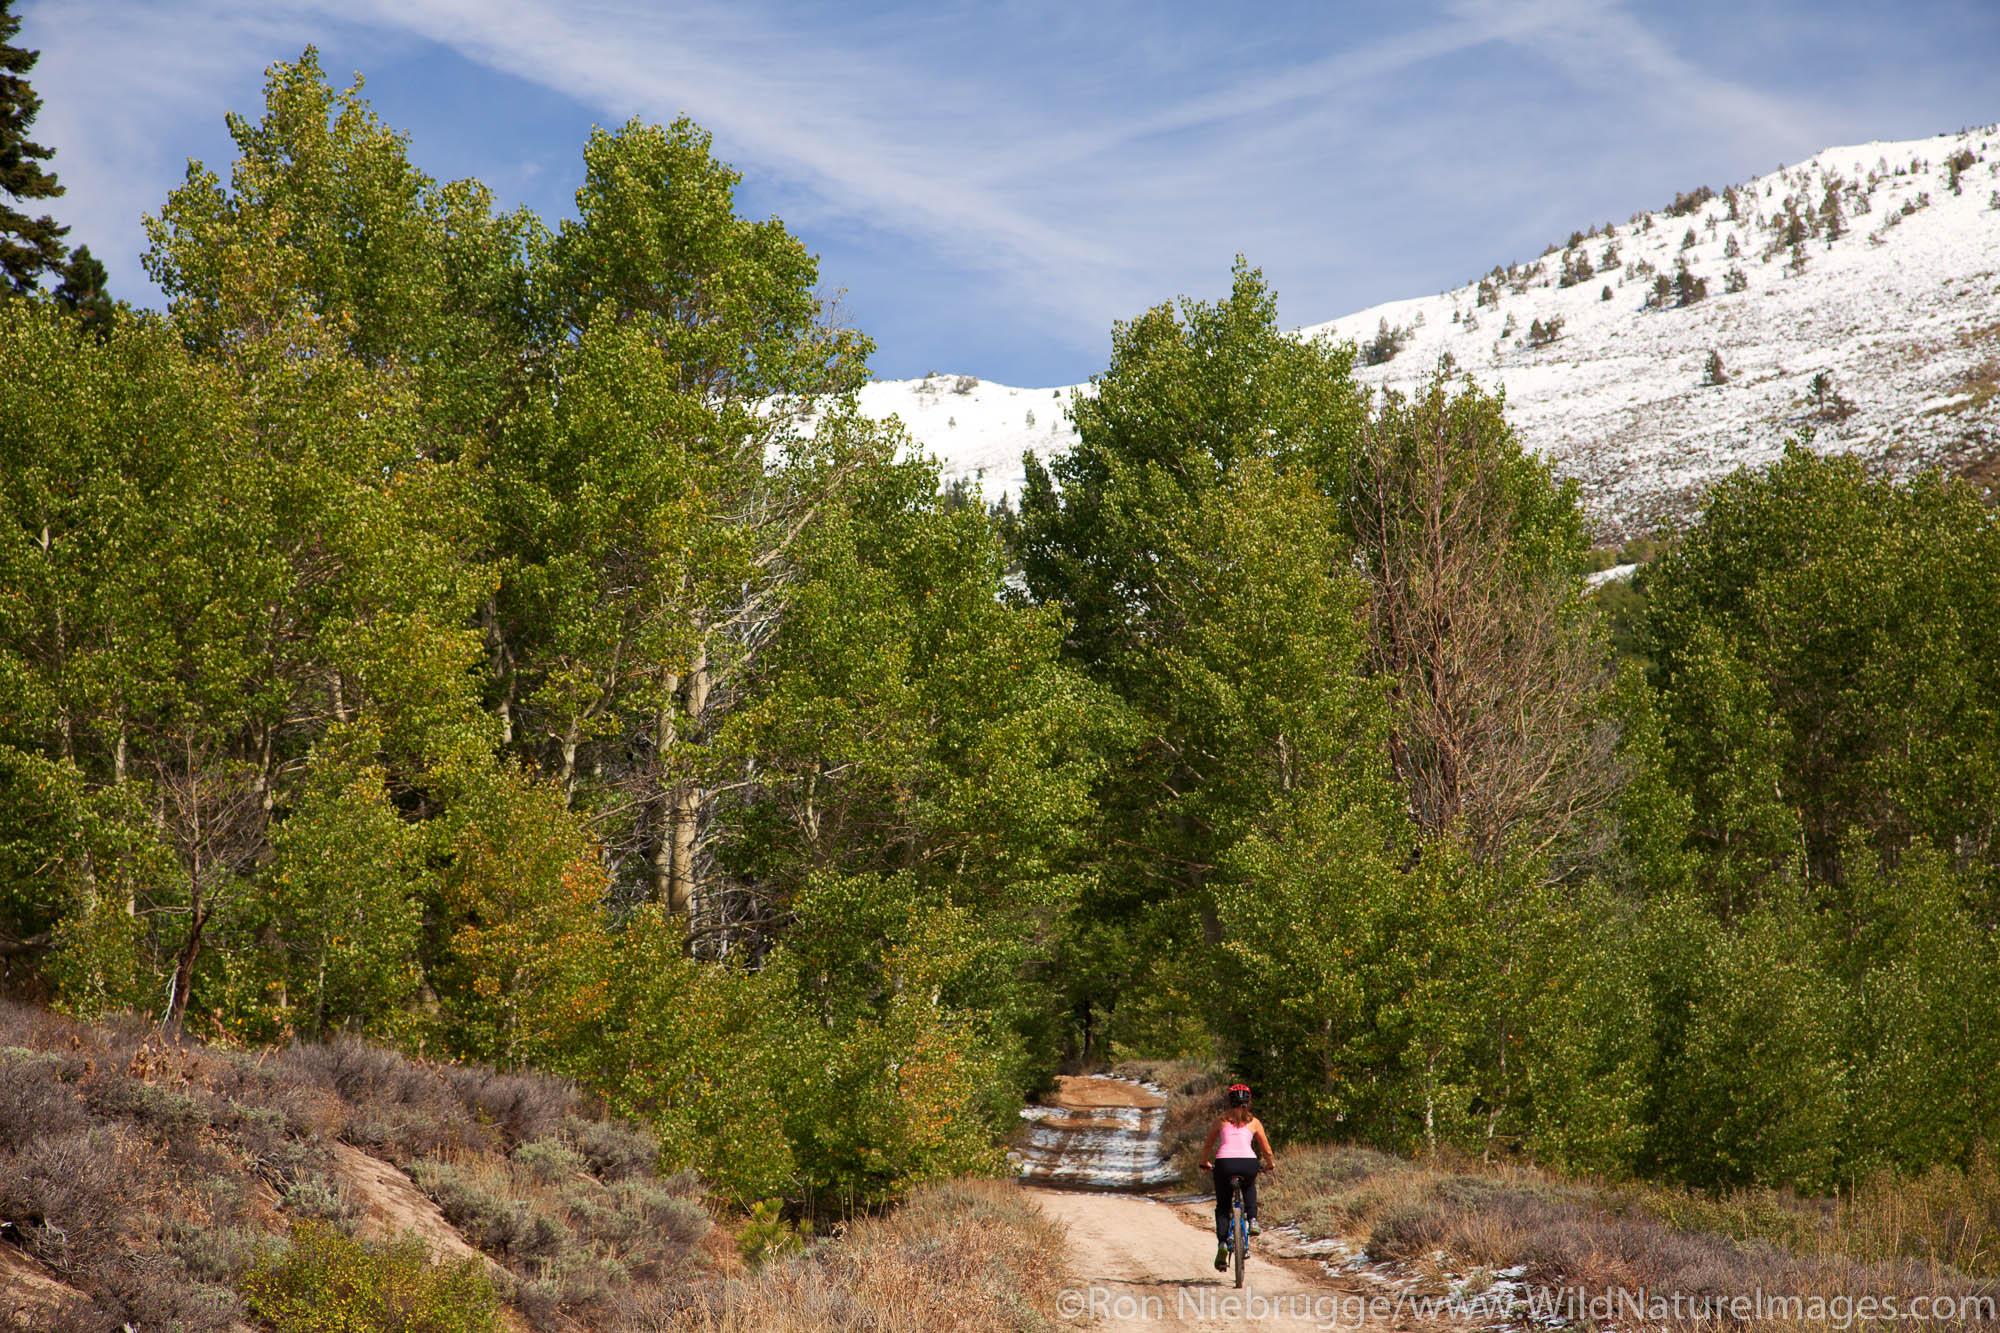 Mountain biking on the Flume Trail, Lake Tahoe, NV (model released)